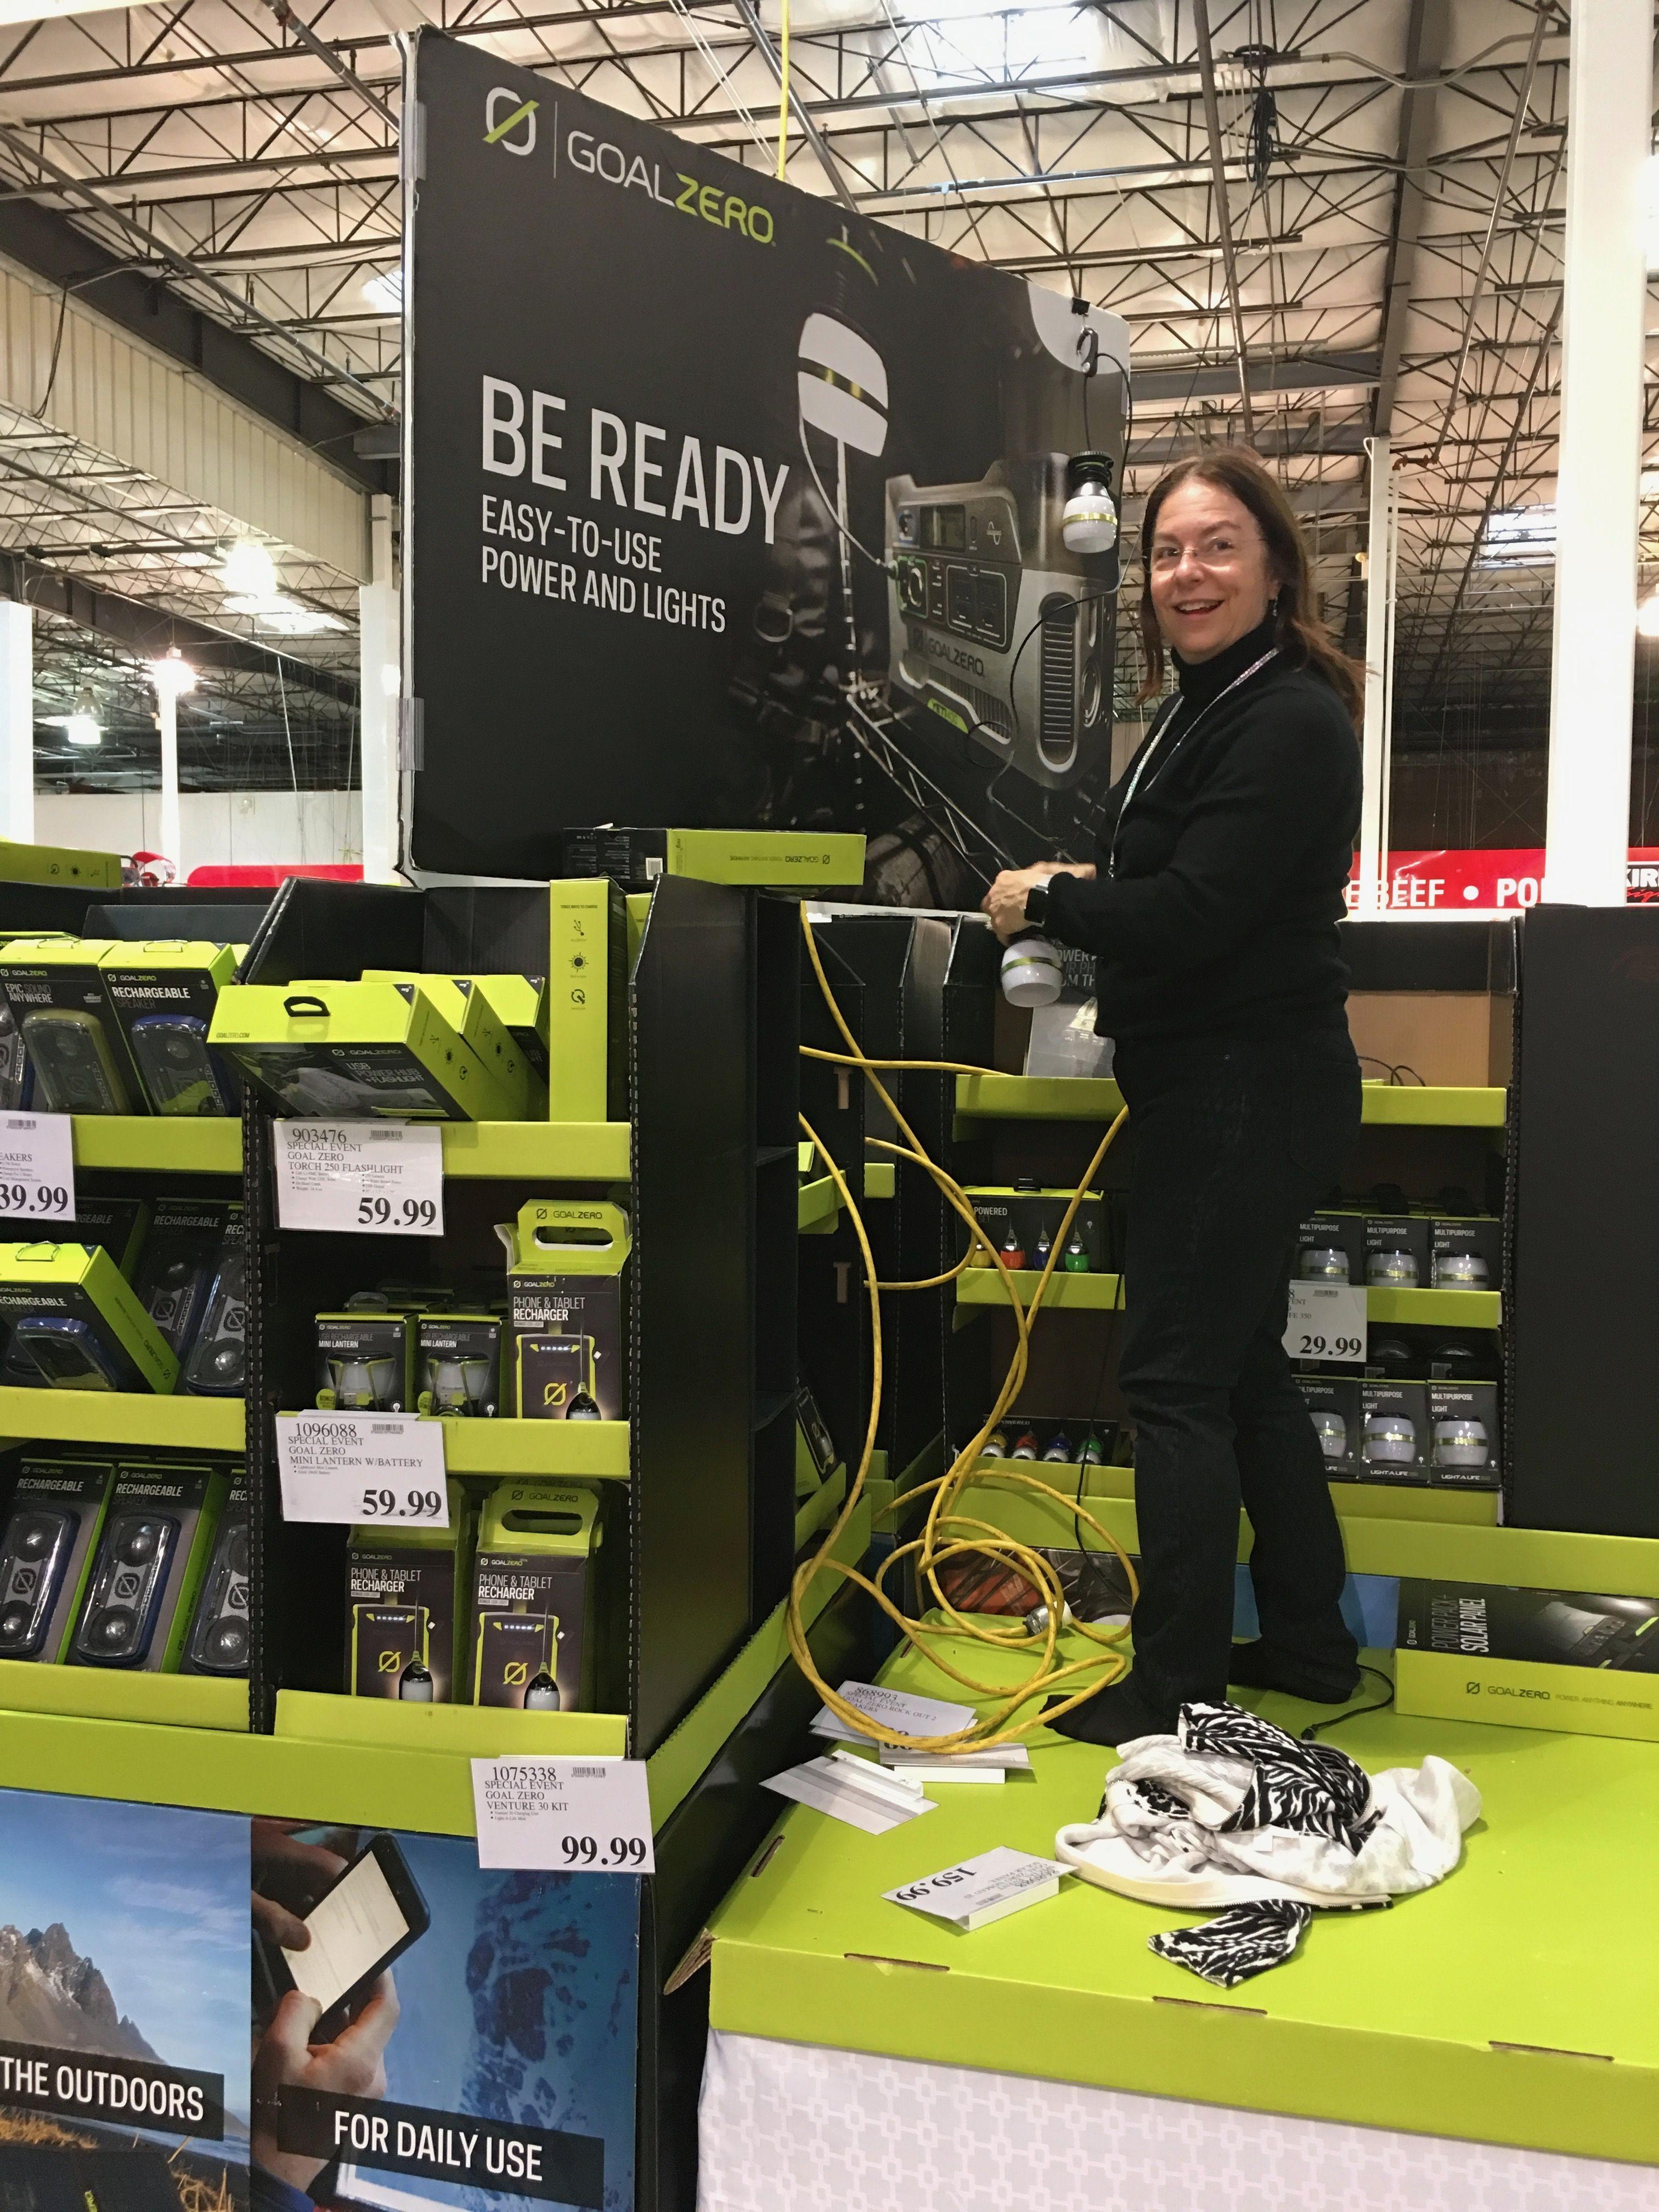 Behind the scene glimpse Suzie Solar rea s her Goal Zero sales